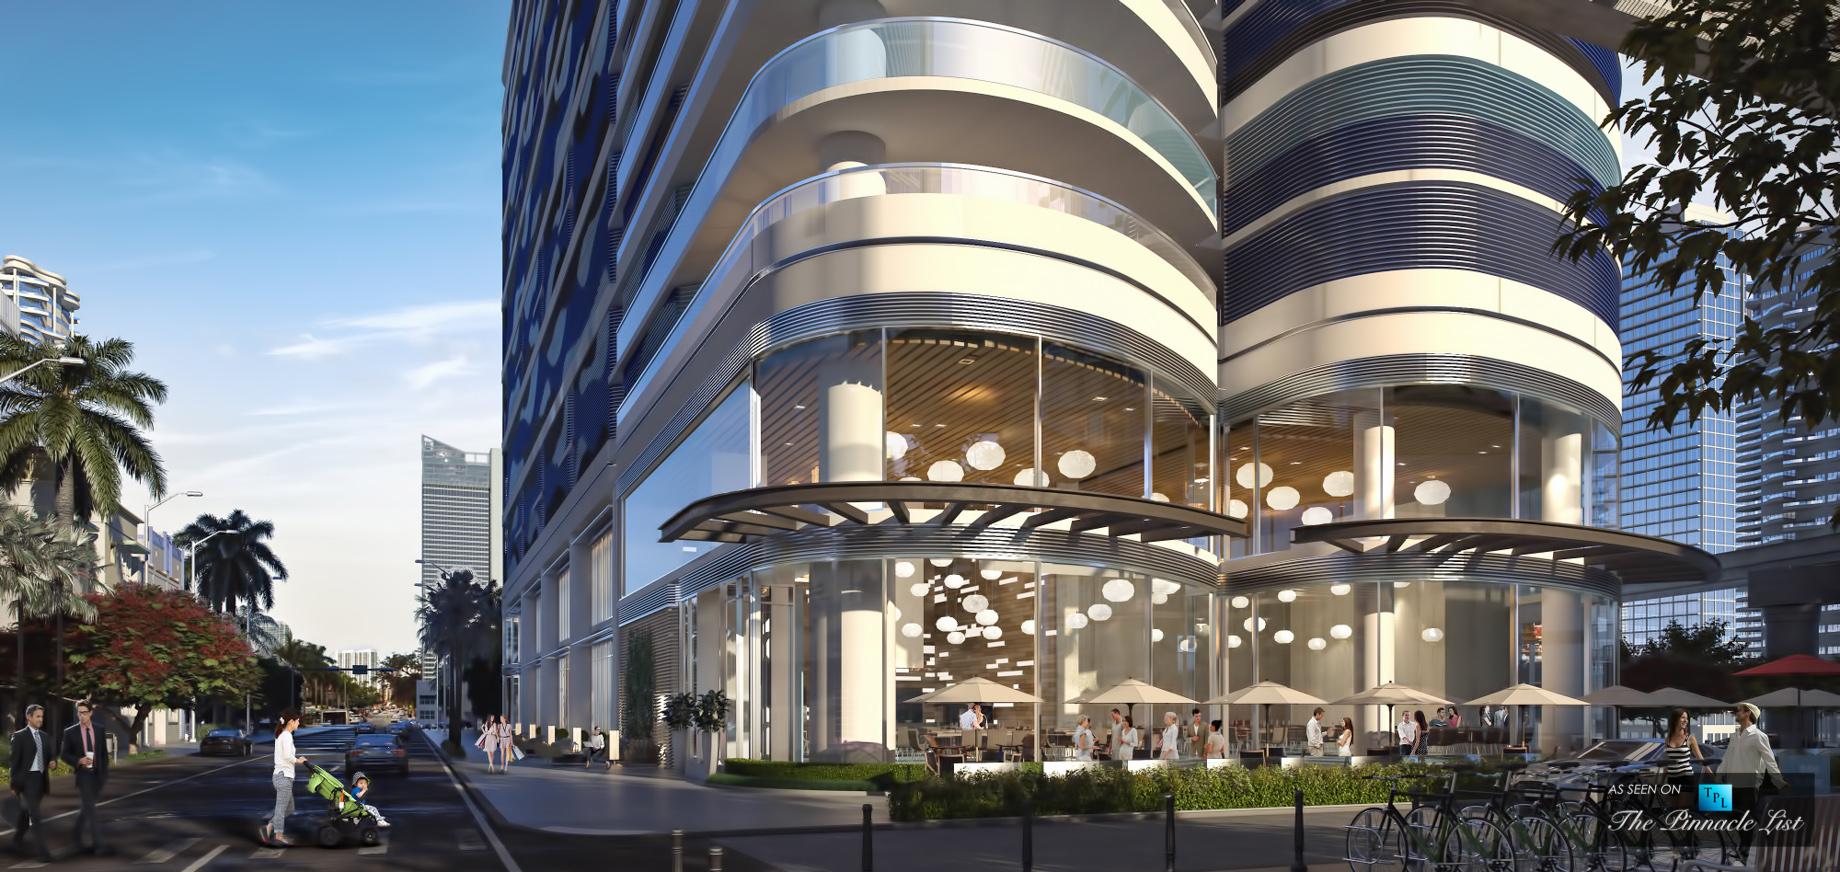 Brickell Flatiron Luxury Development - 1001 S Miami Ave, Miami, FL, USA